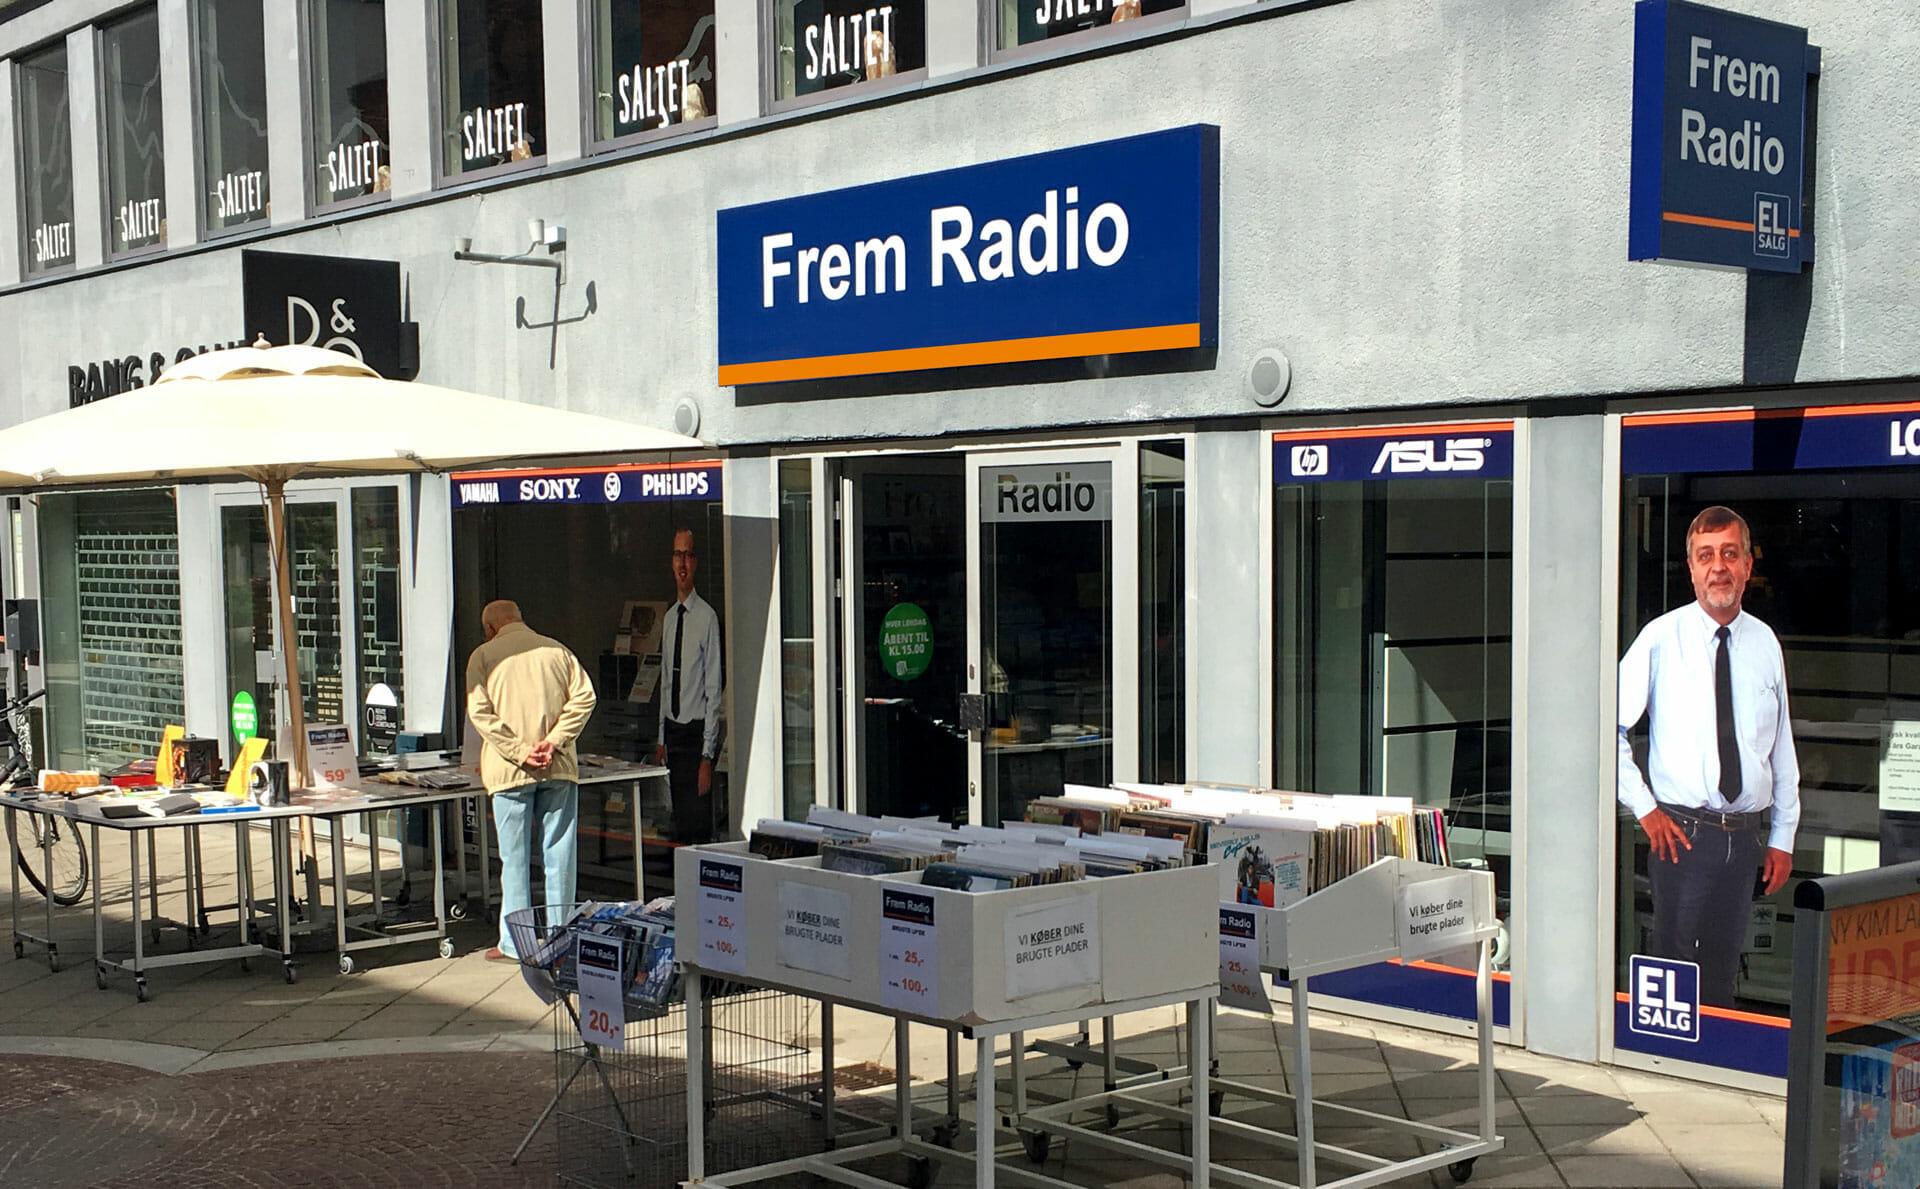 El- Salg Frem Radio